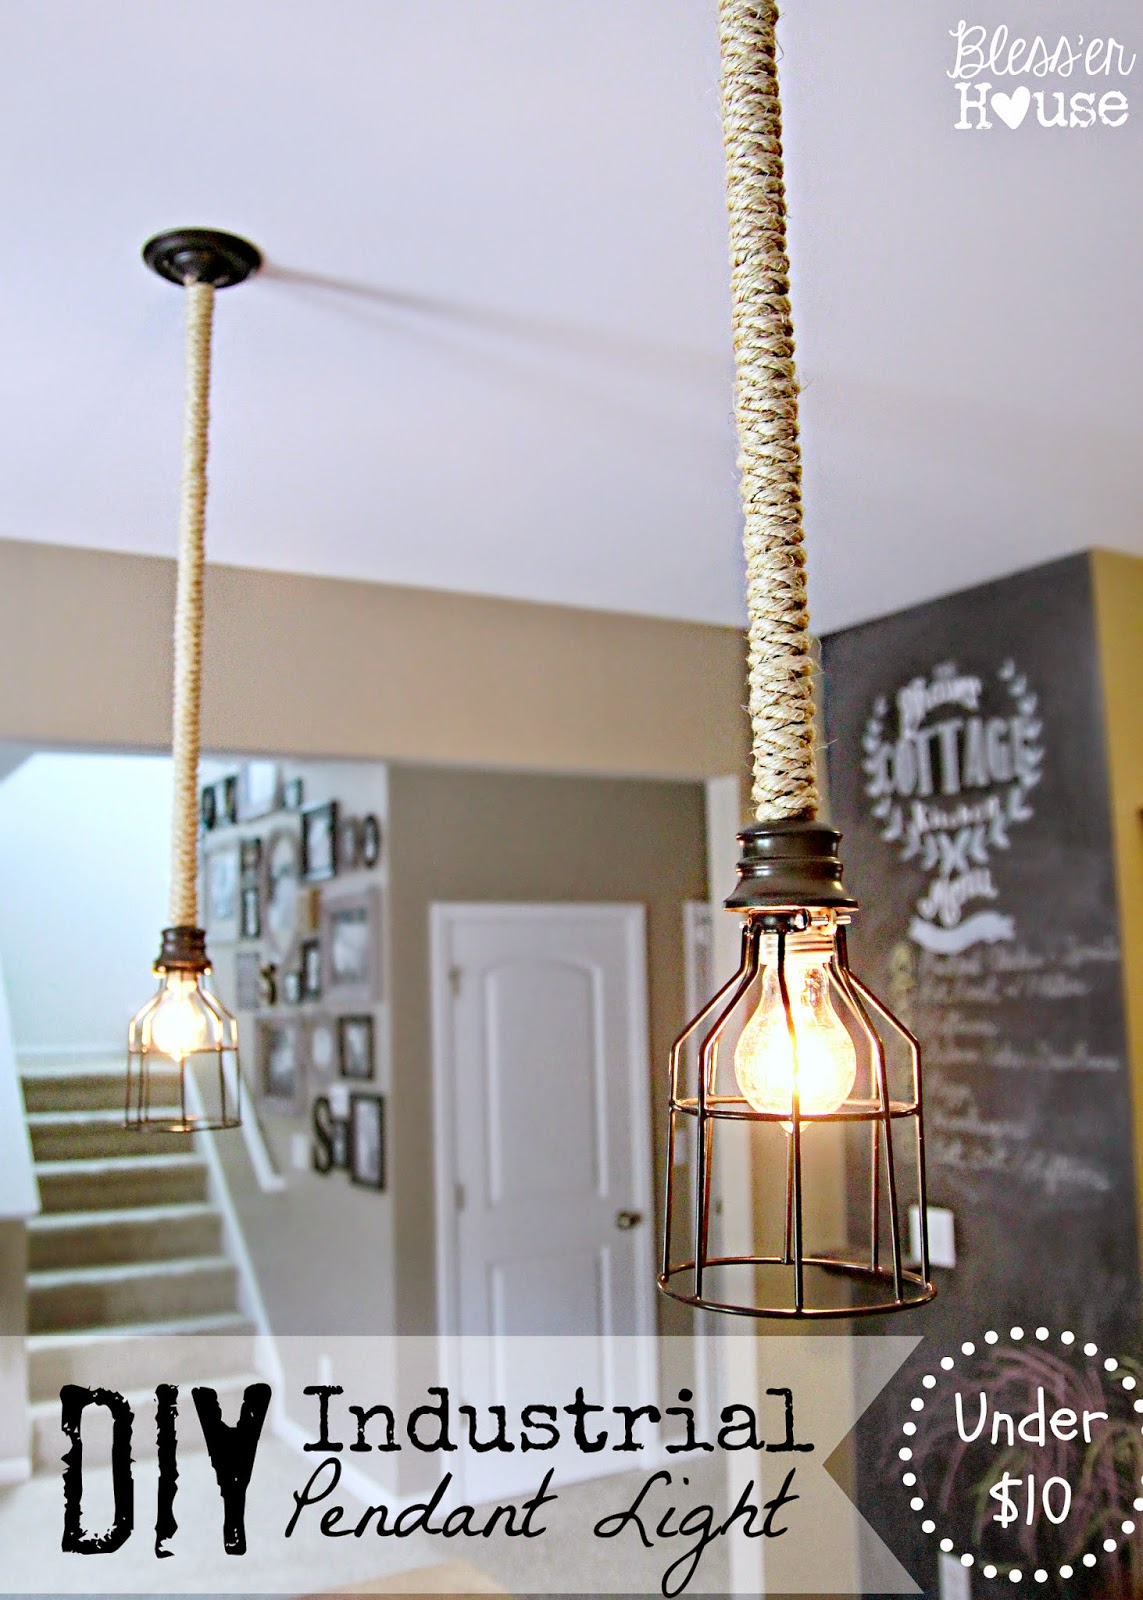 5 diy industrial light fixtures for industrial kitchen lighting Bless er House 5 DIY Industrial Light Fixtures for Under 25